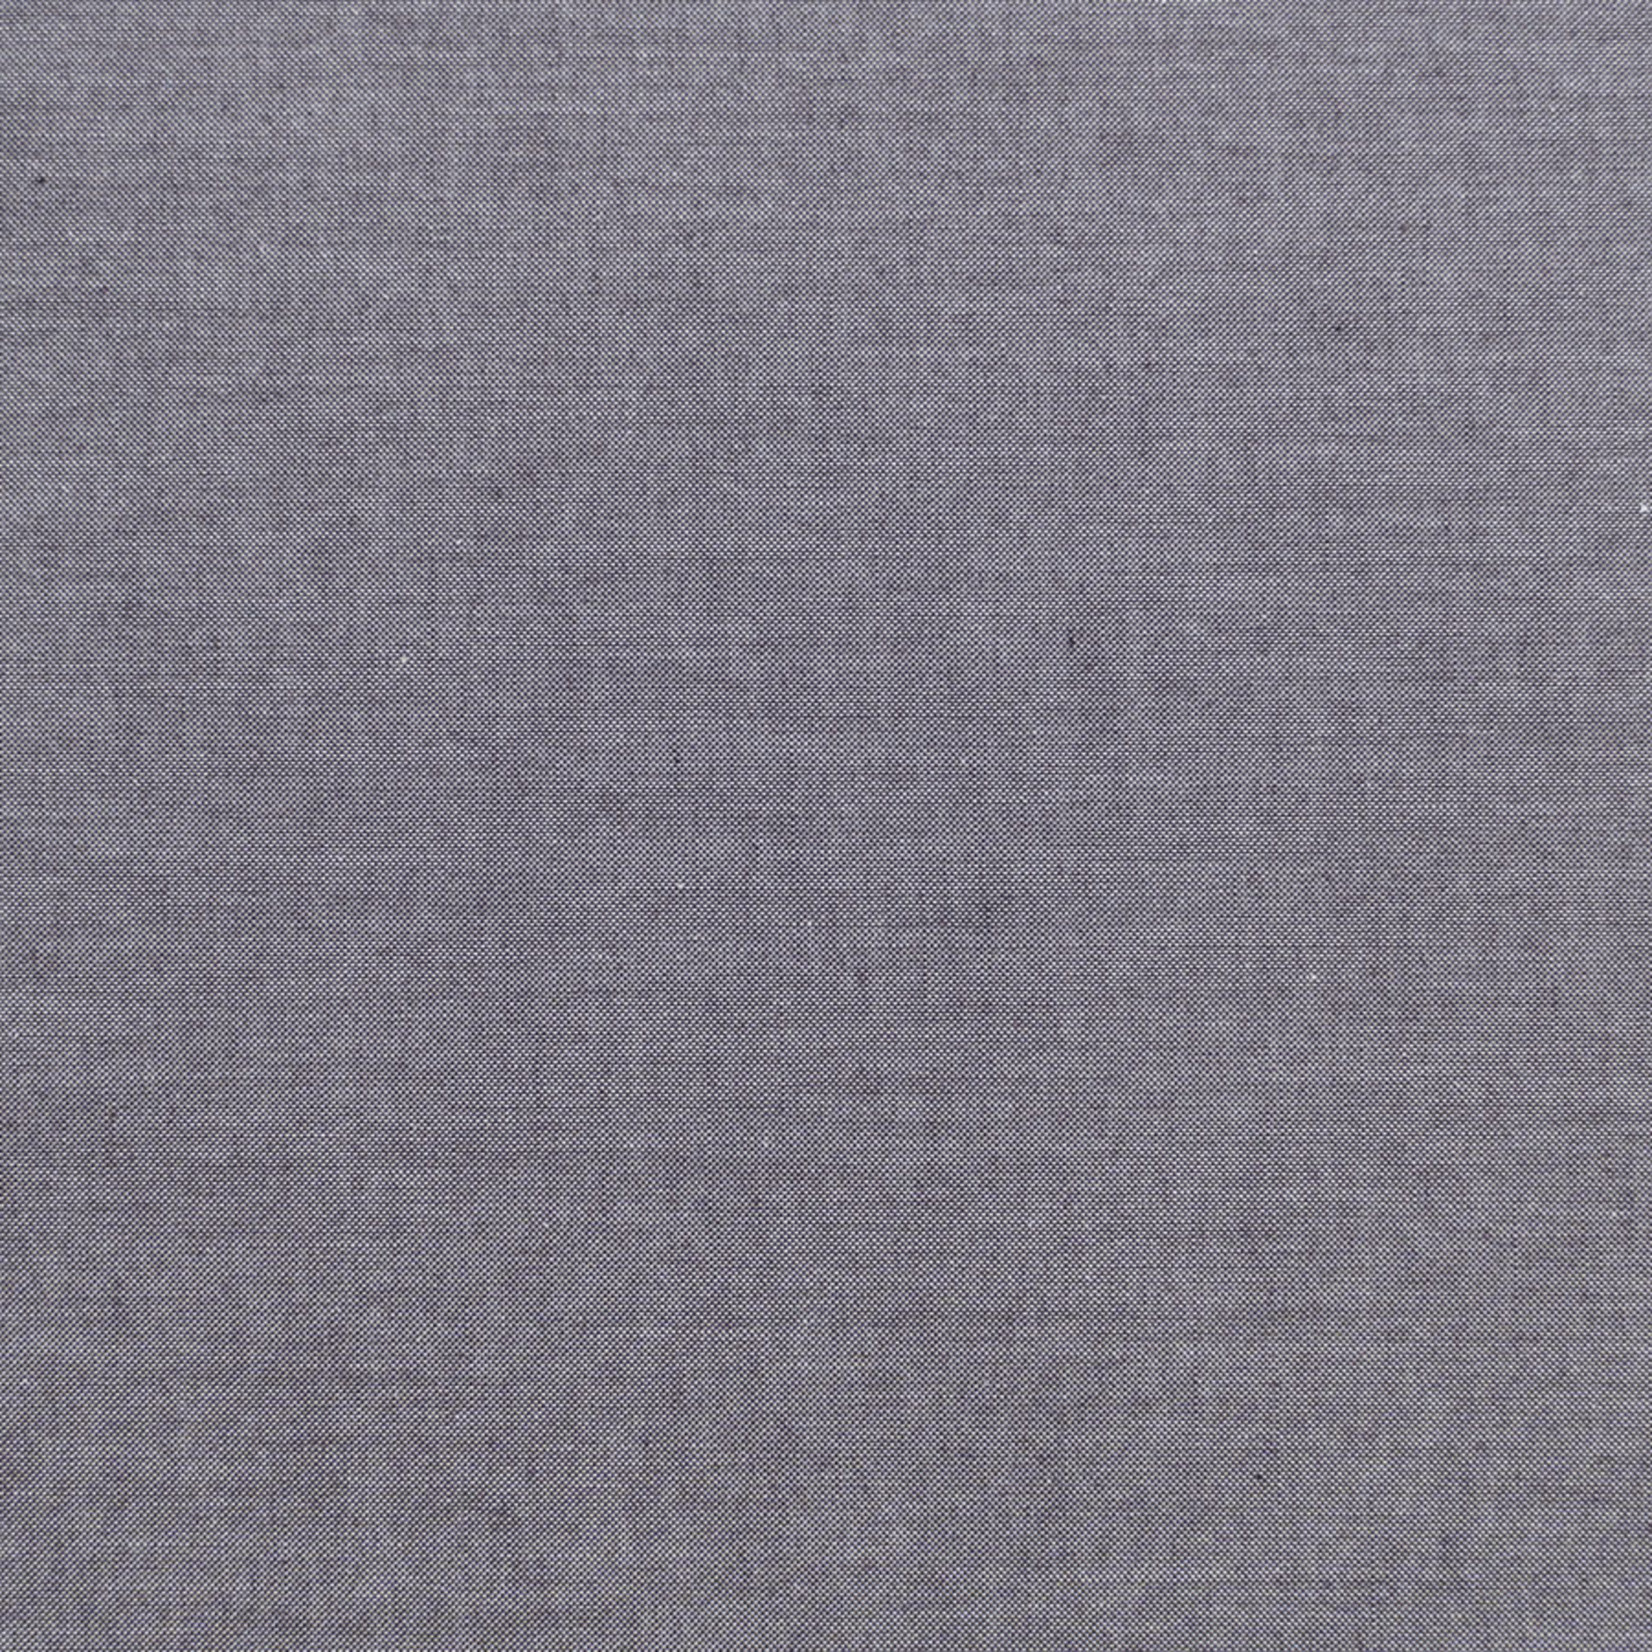 Tilda Tilda Basics, Chambray, Grey 160006 $0.22 per cm or $22/m